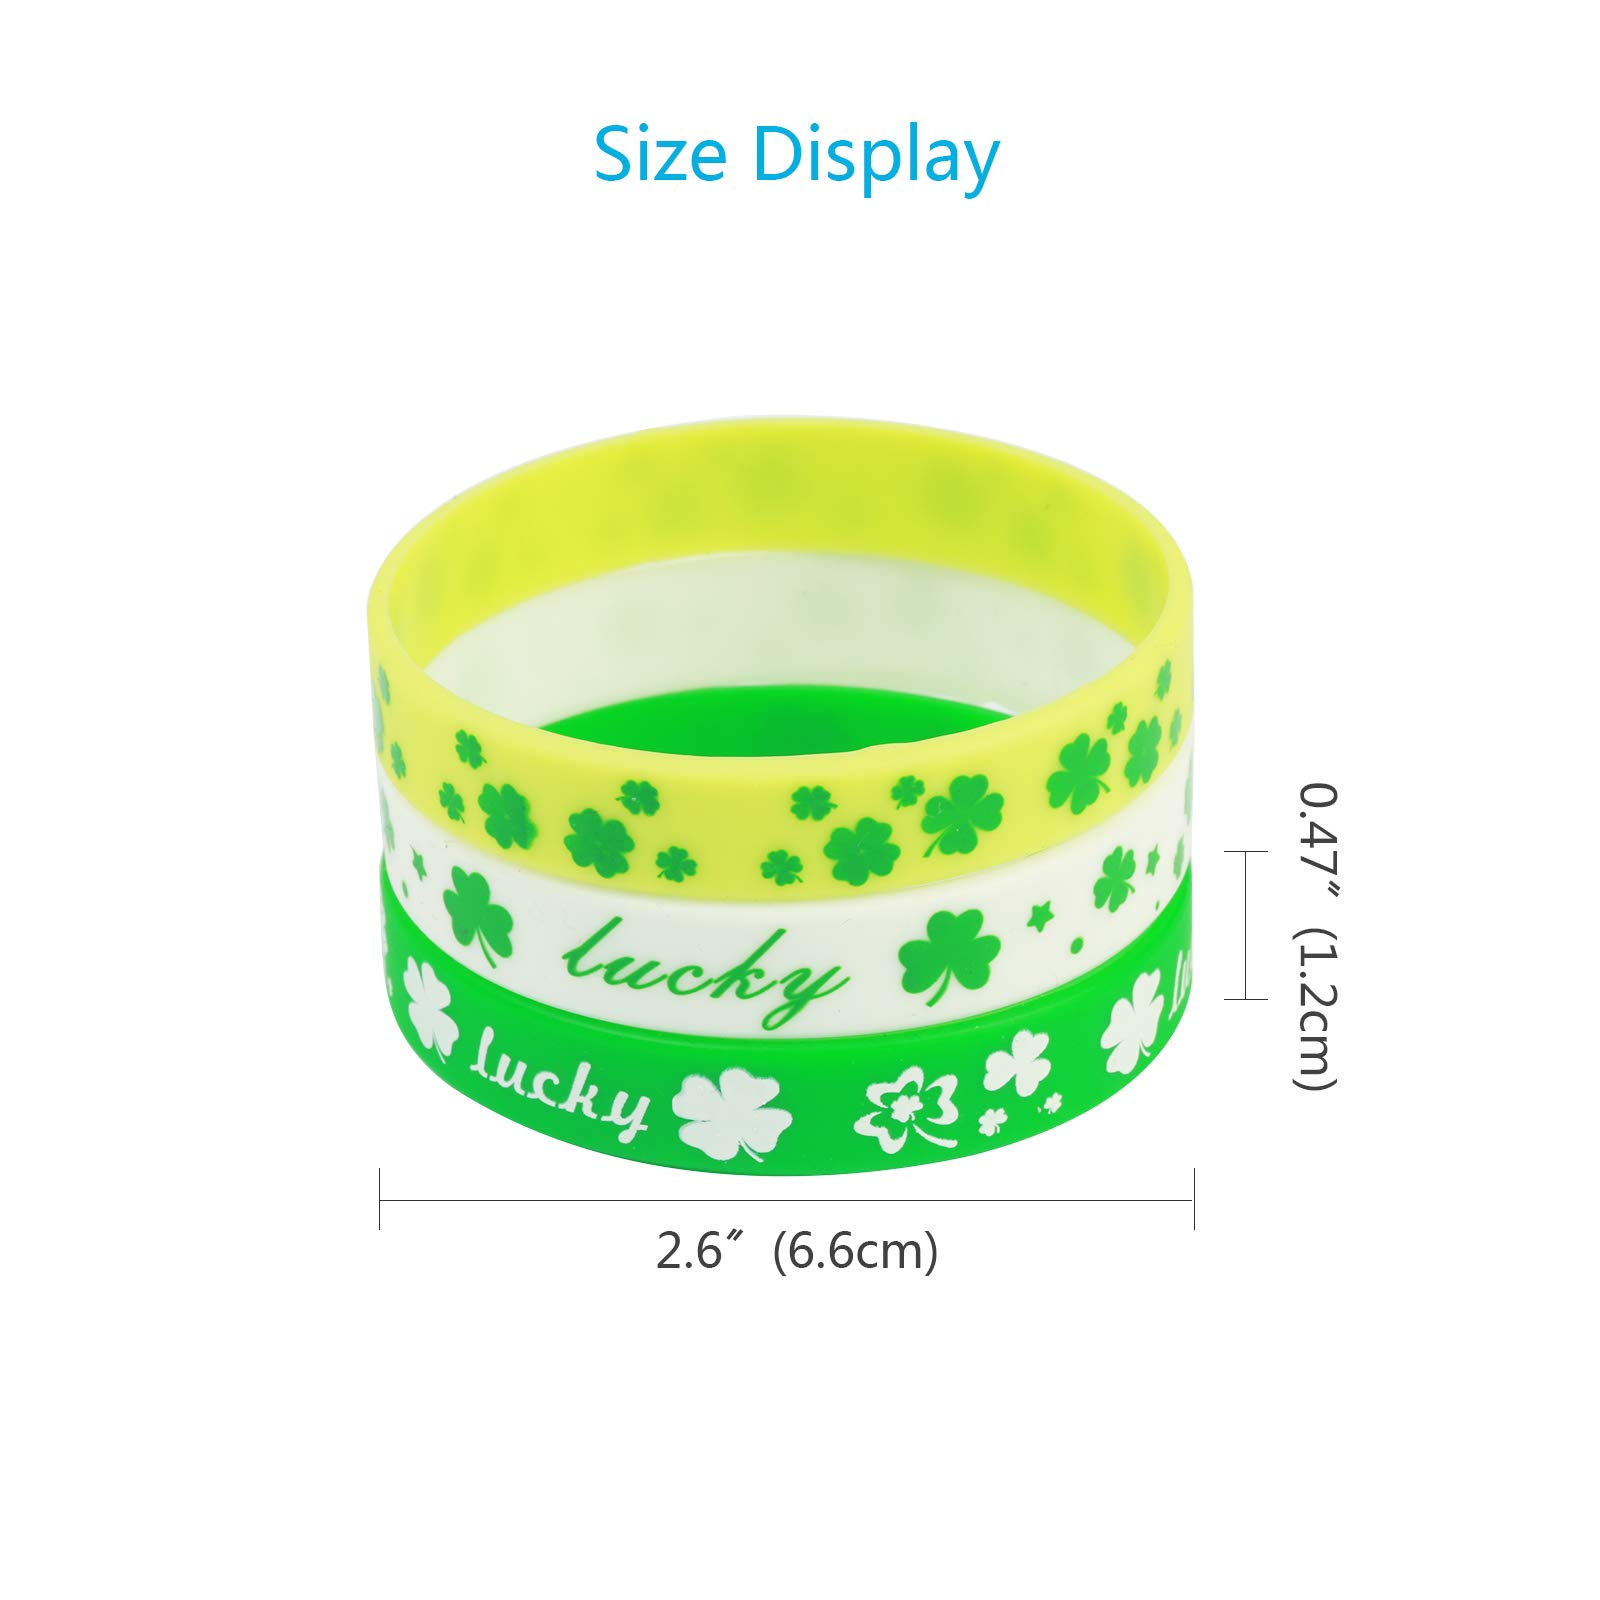 ZERHOK St Patrick\'s Day Shamrock Bracelets, 36pcs Clover Wristbands Silicone Bracelet Sets in 3 for Irish Day Party Favor Supplies Decorations